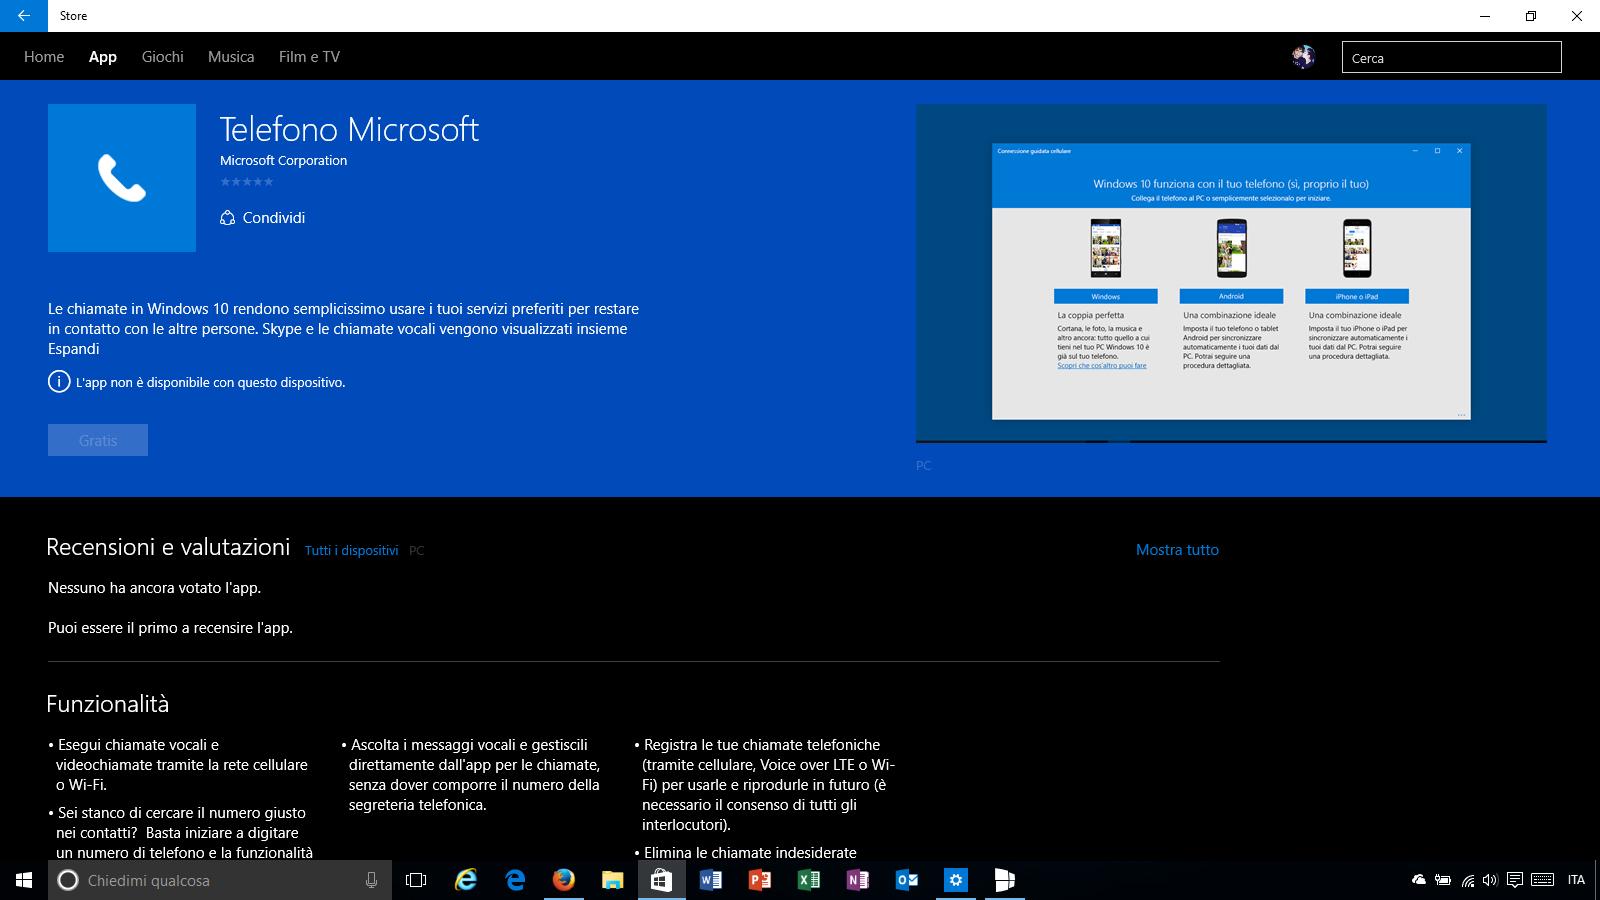 Telefono Microsoft